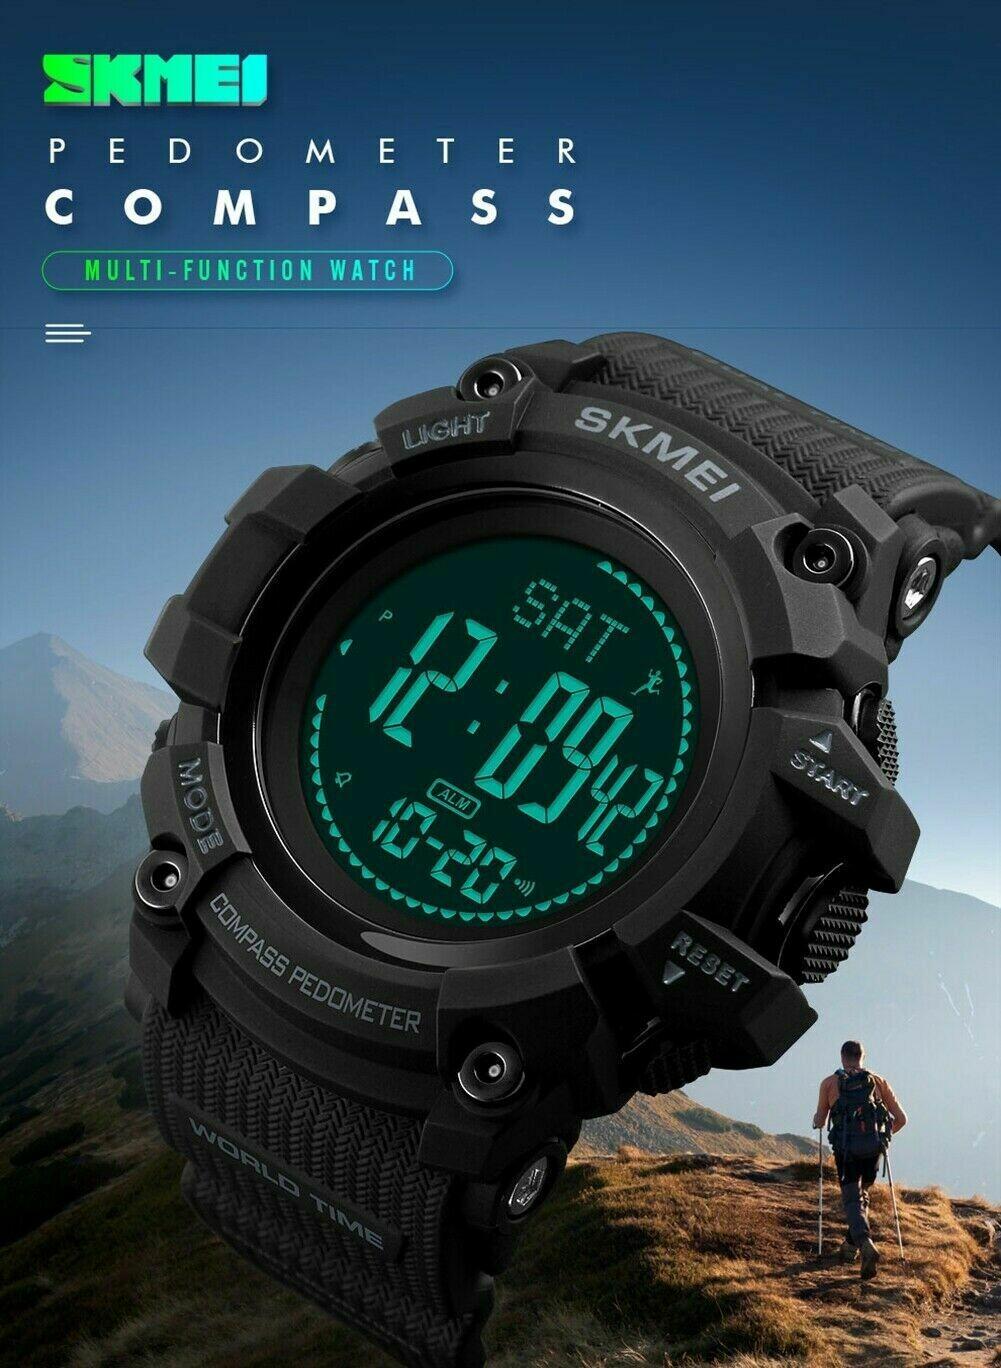 SKMEI Sport Water Resistant Digital Watch - Multi Sensors